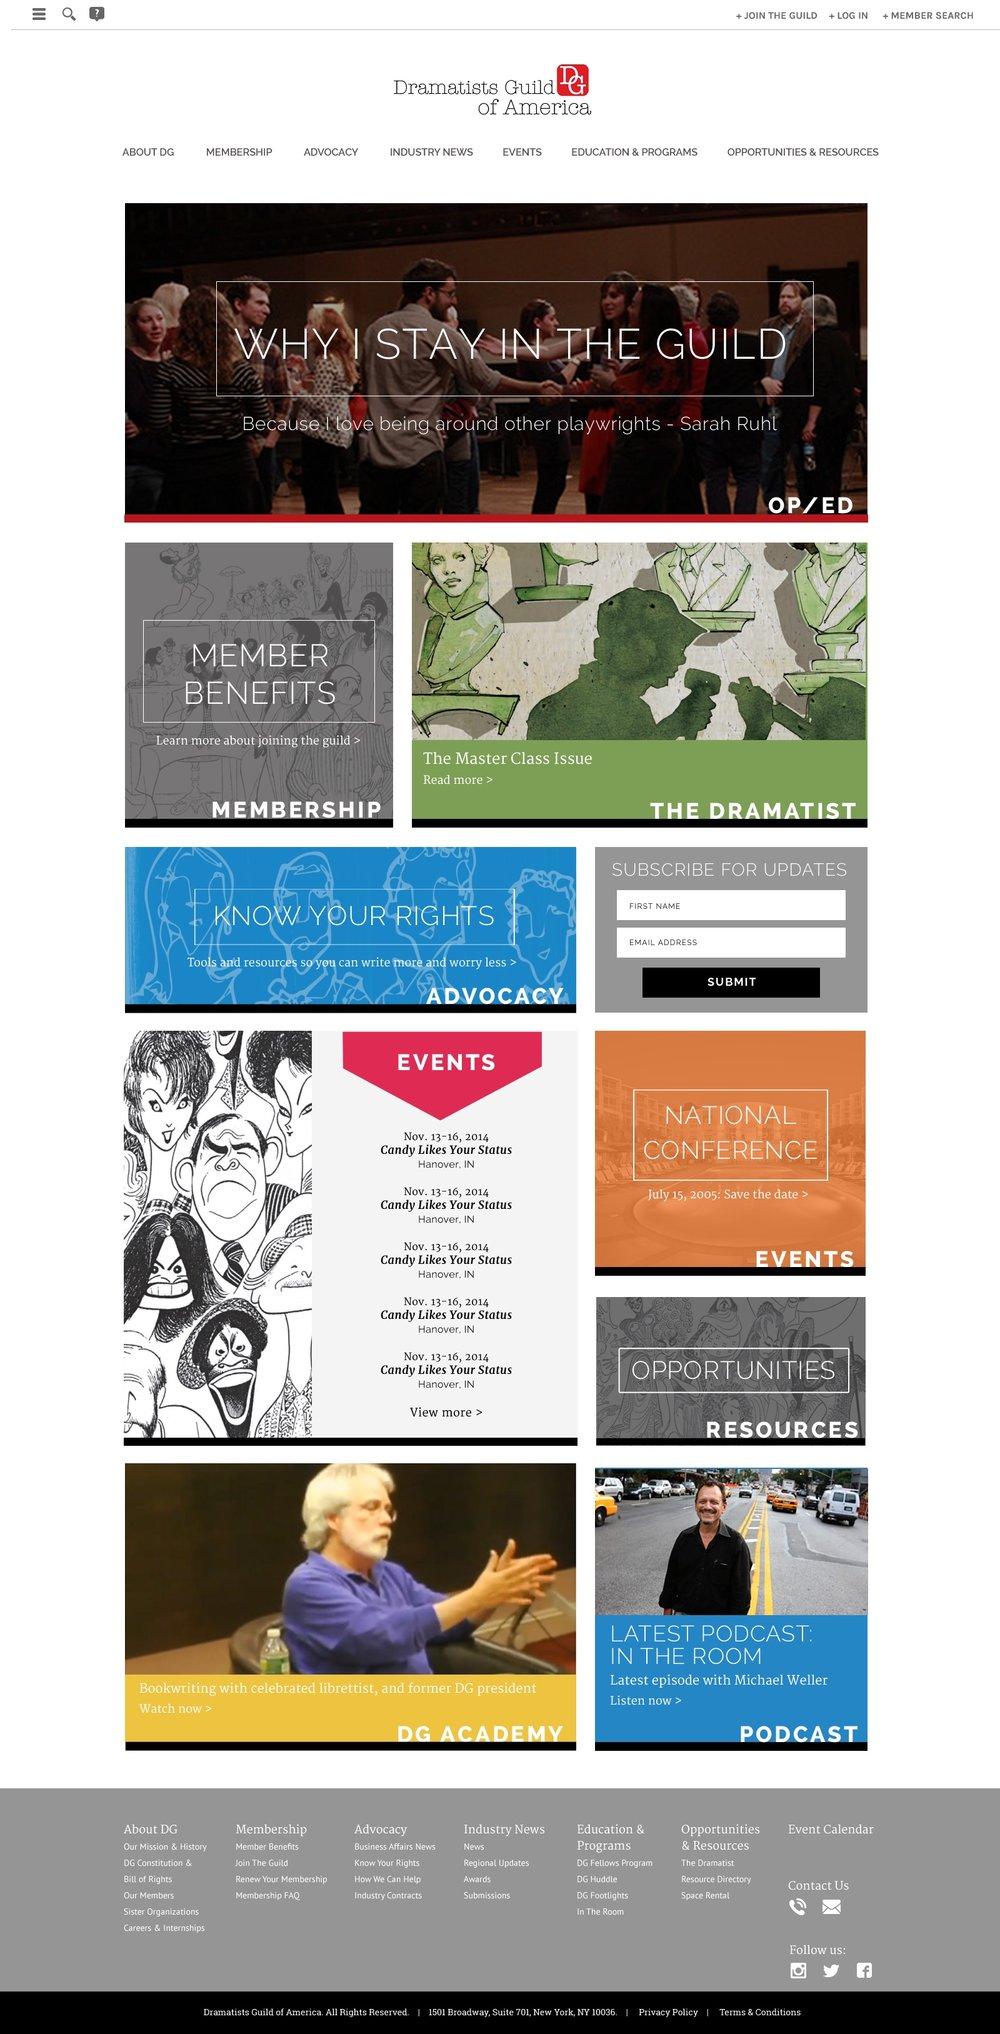 homepage-v4 (1).jpg